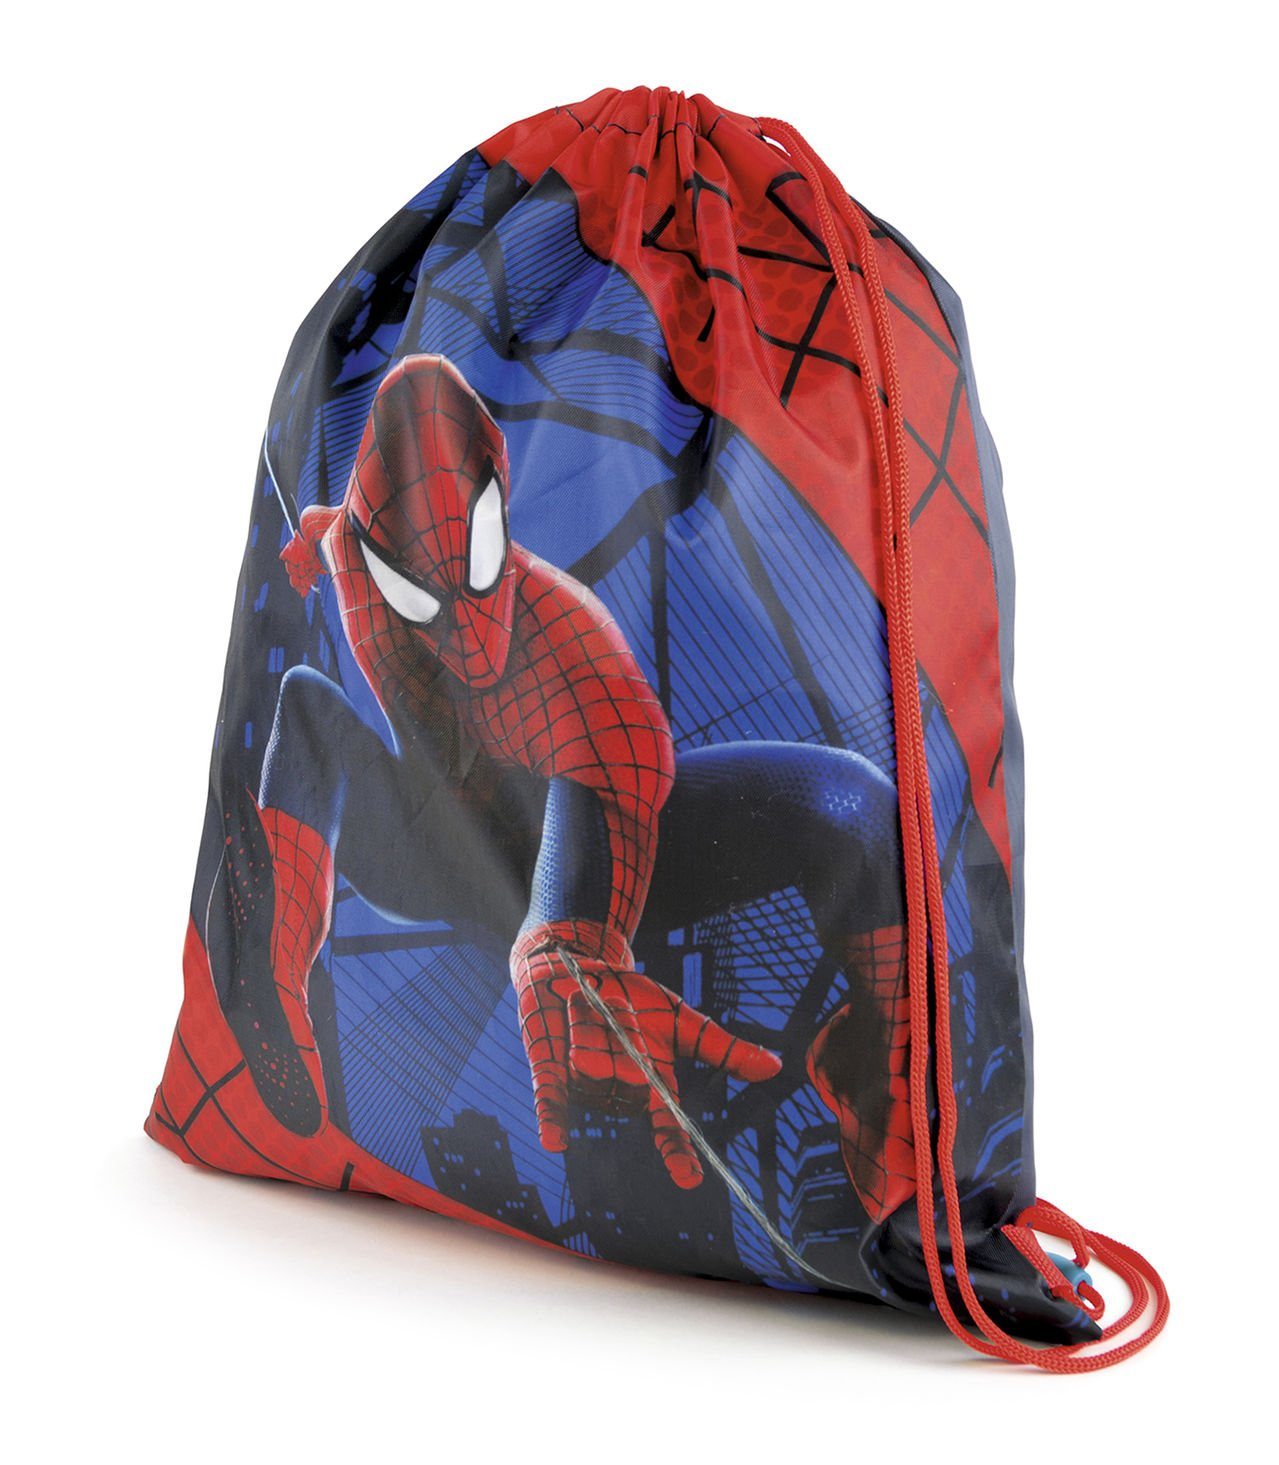 a2b06314db7a Kids Childrens Marvel Comics Avengers Spiderman Drawstring School Gym Swim  Shoe Bag  Amazon.co.uk  Luggage